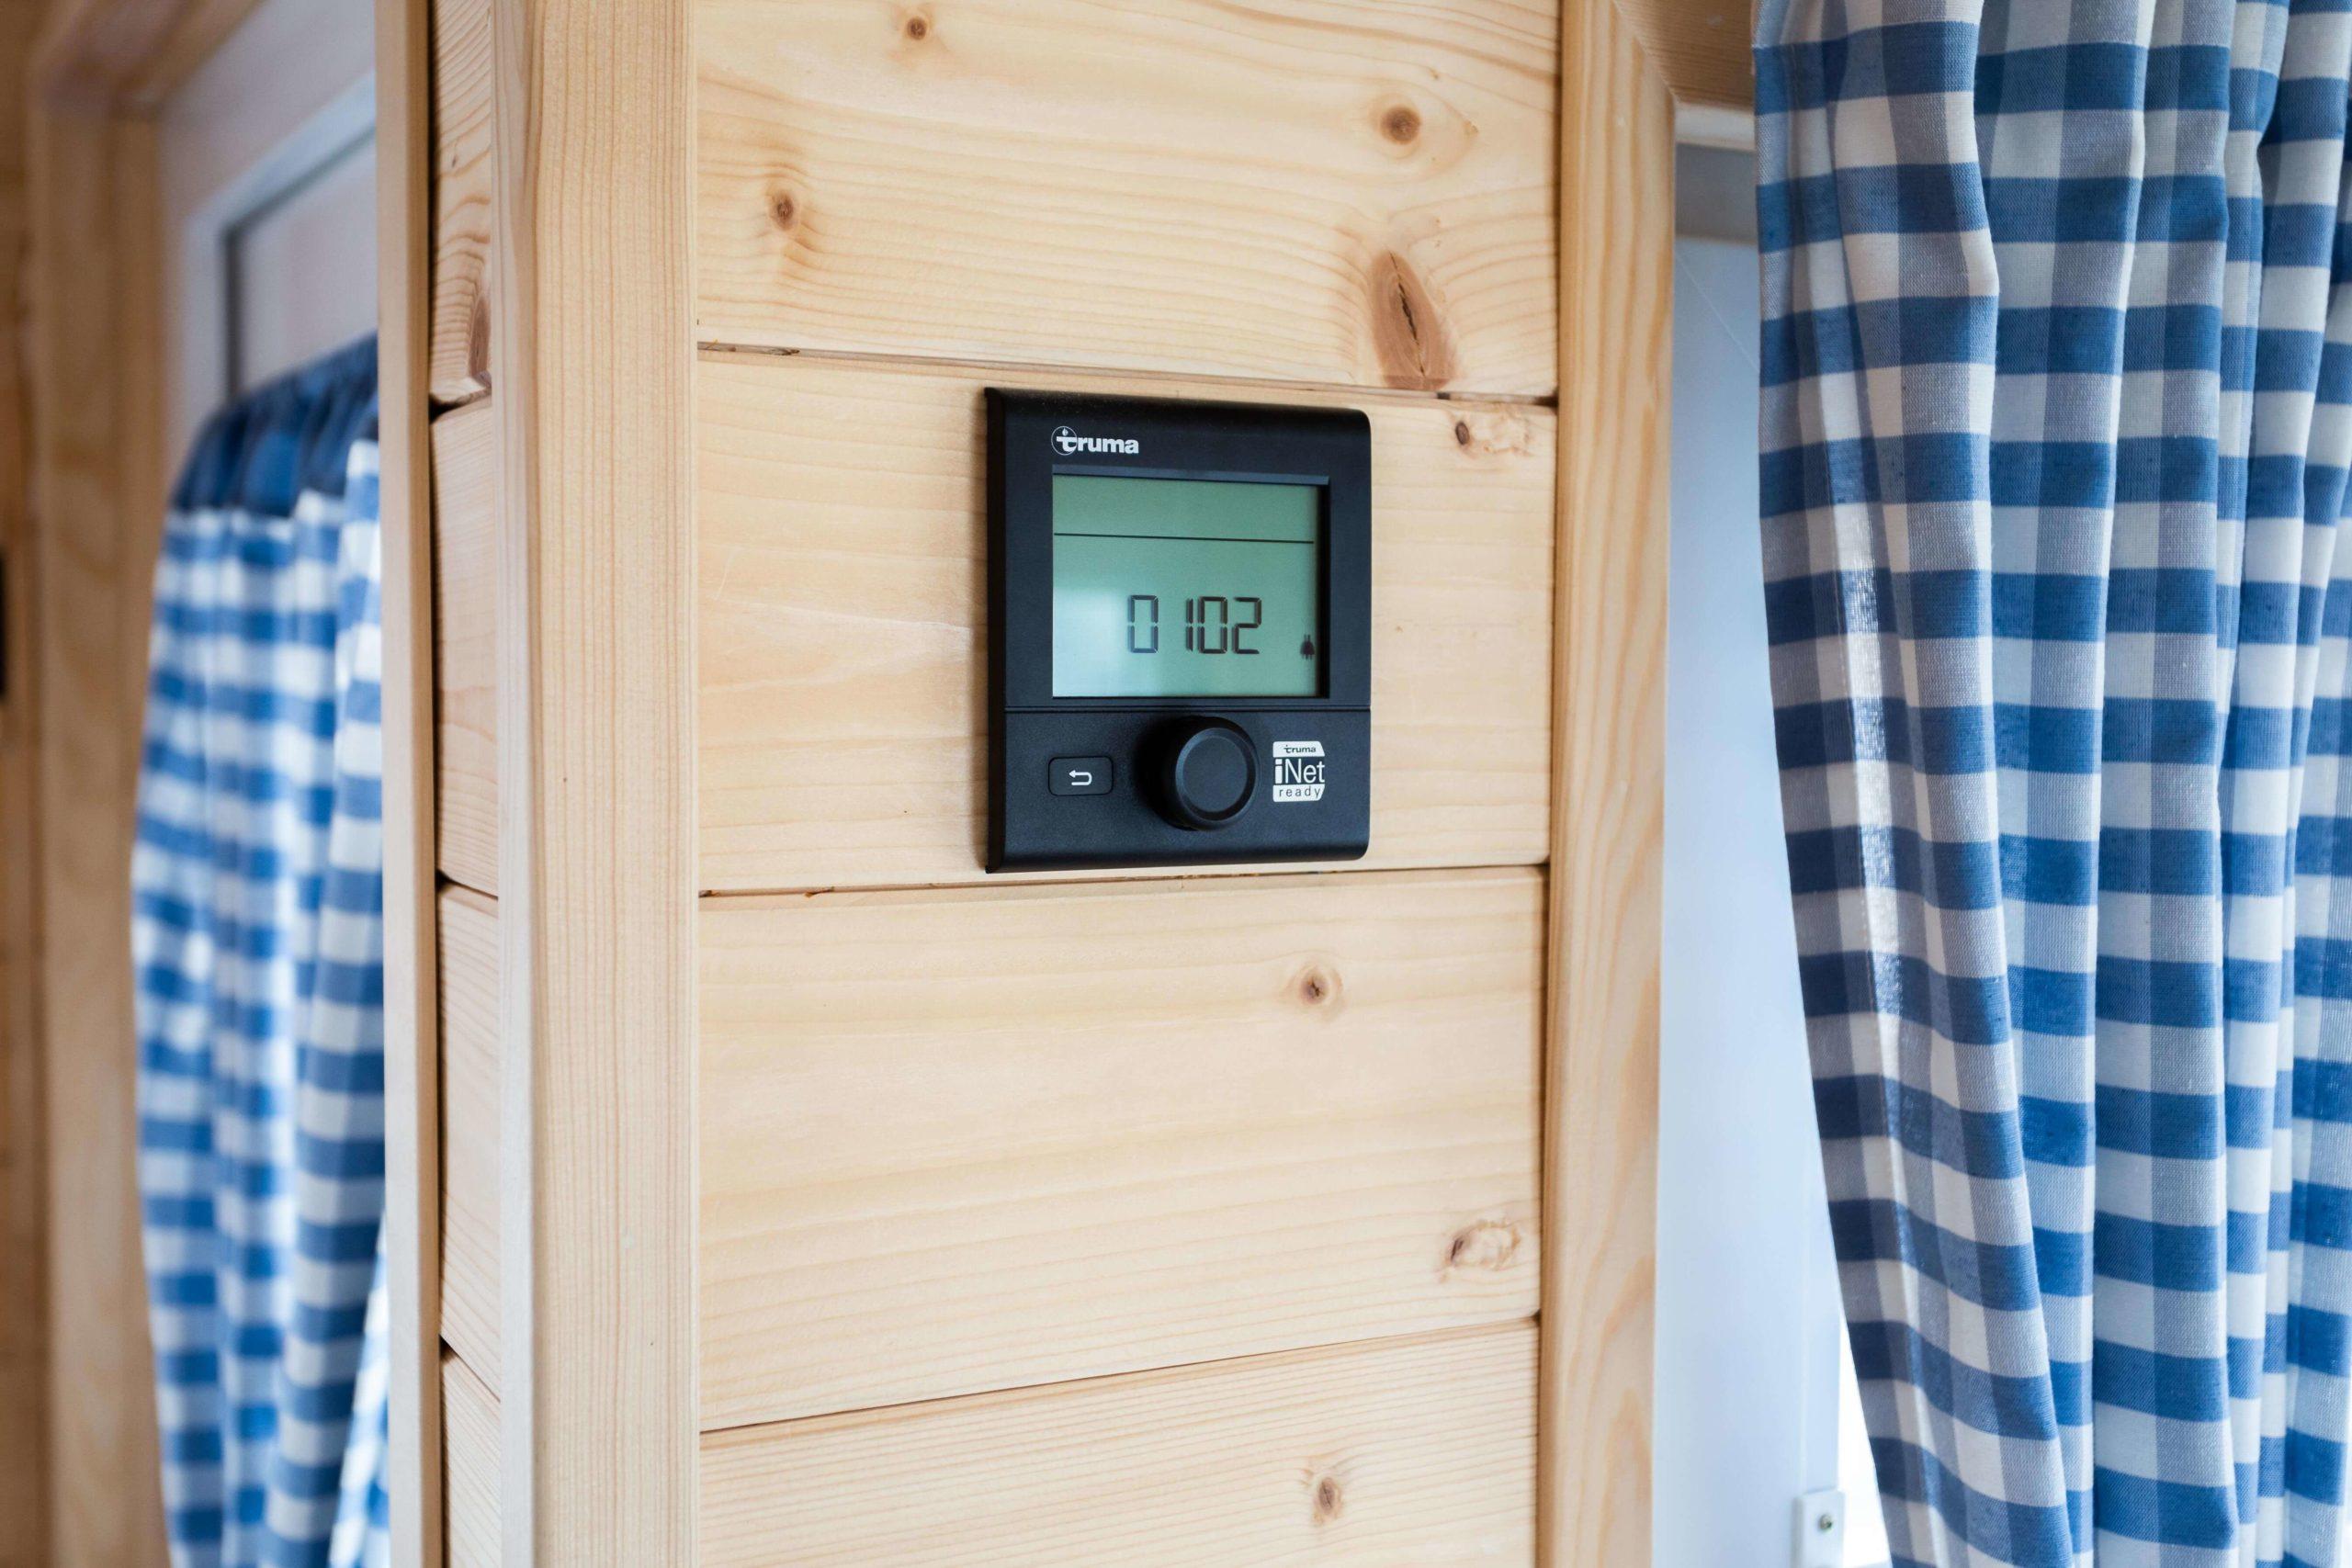 mobiles-tiny-house-island-vital-camp-gmbh-43